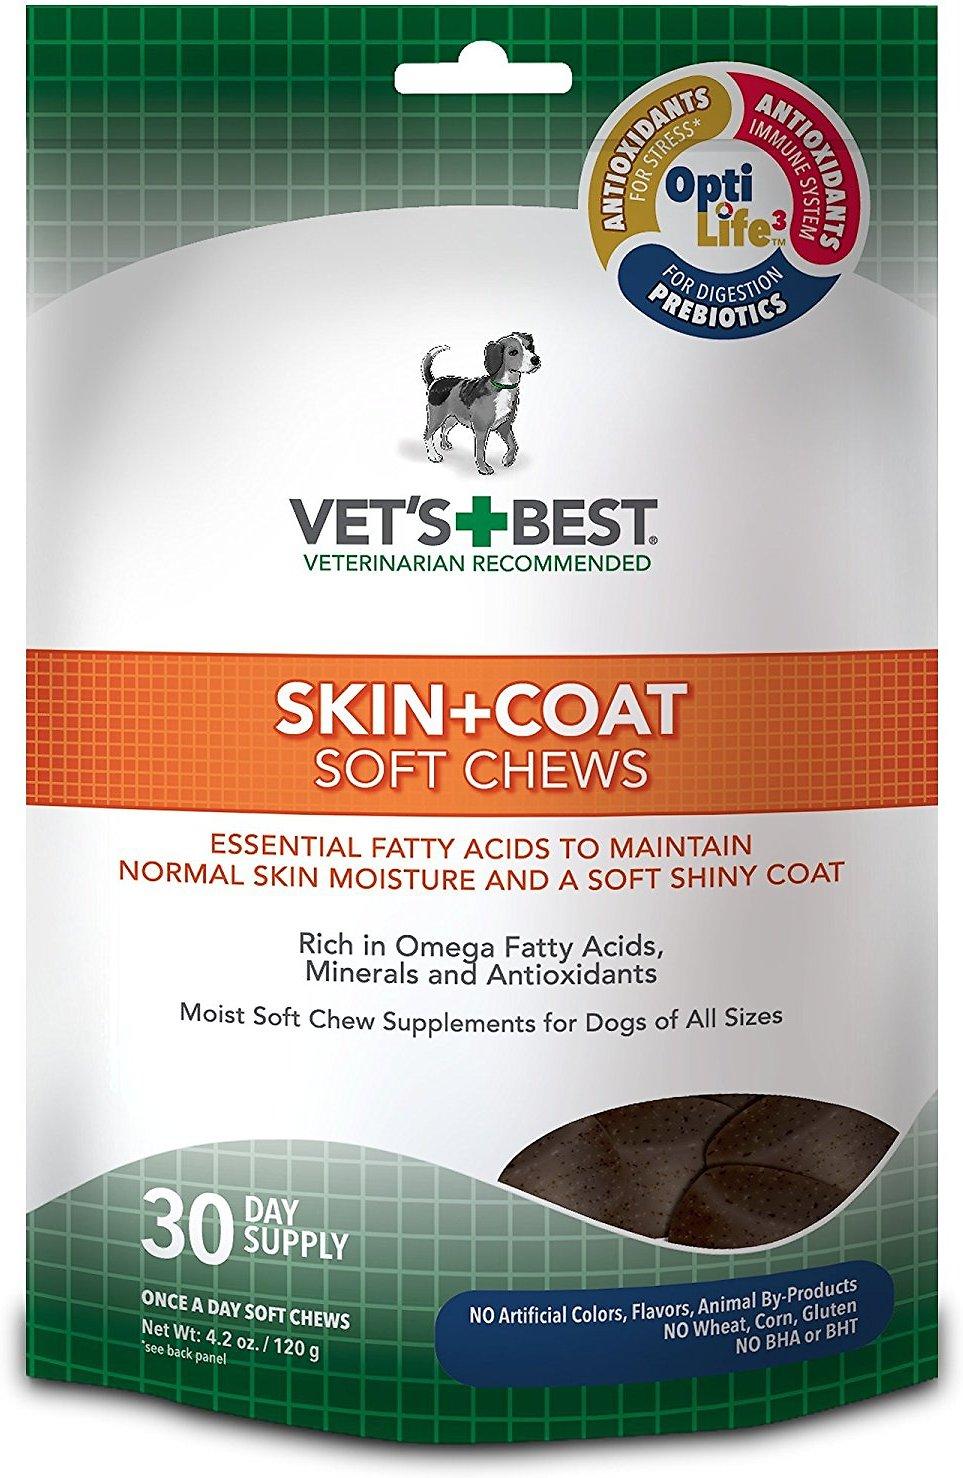 Vet's Best Skin + Coat Soft Chews Dog Supplement, 30 count Image